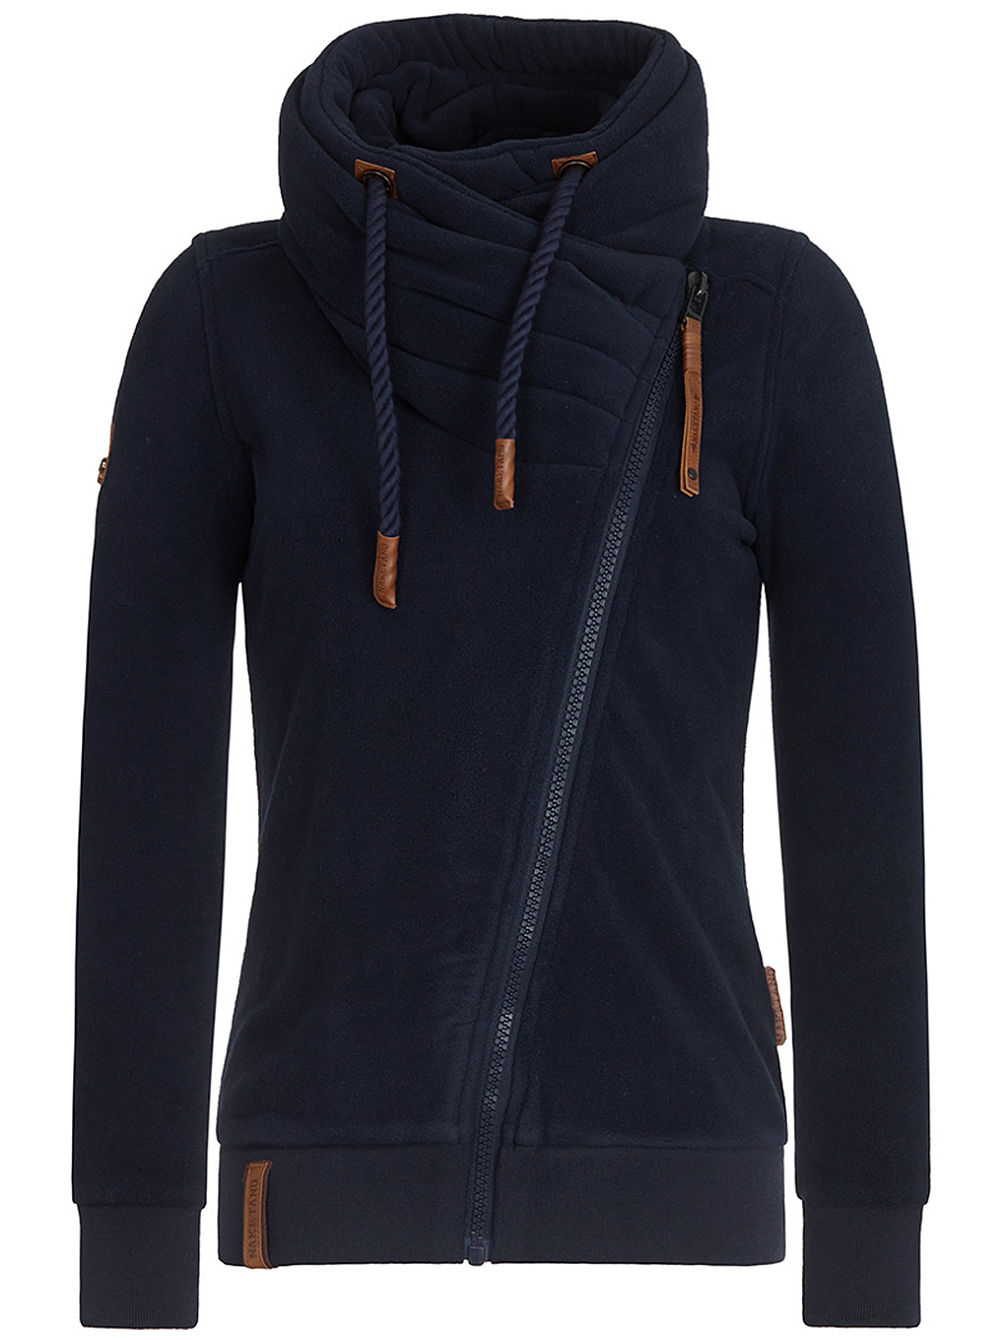 buy naketano j beragend zip hoodie online at blue. Black Bedroom Furniture Sets. Home Design Ideas